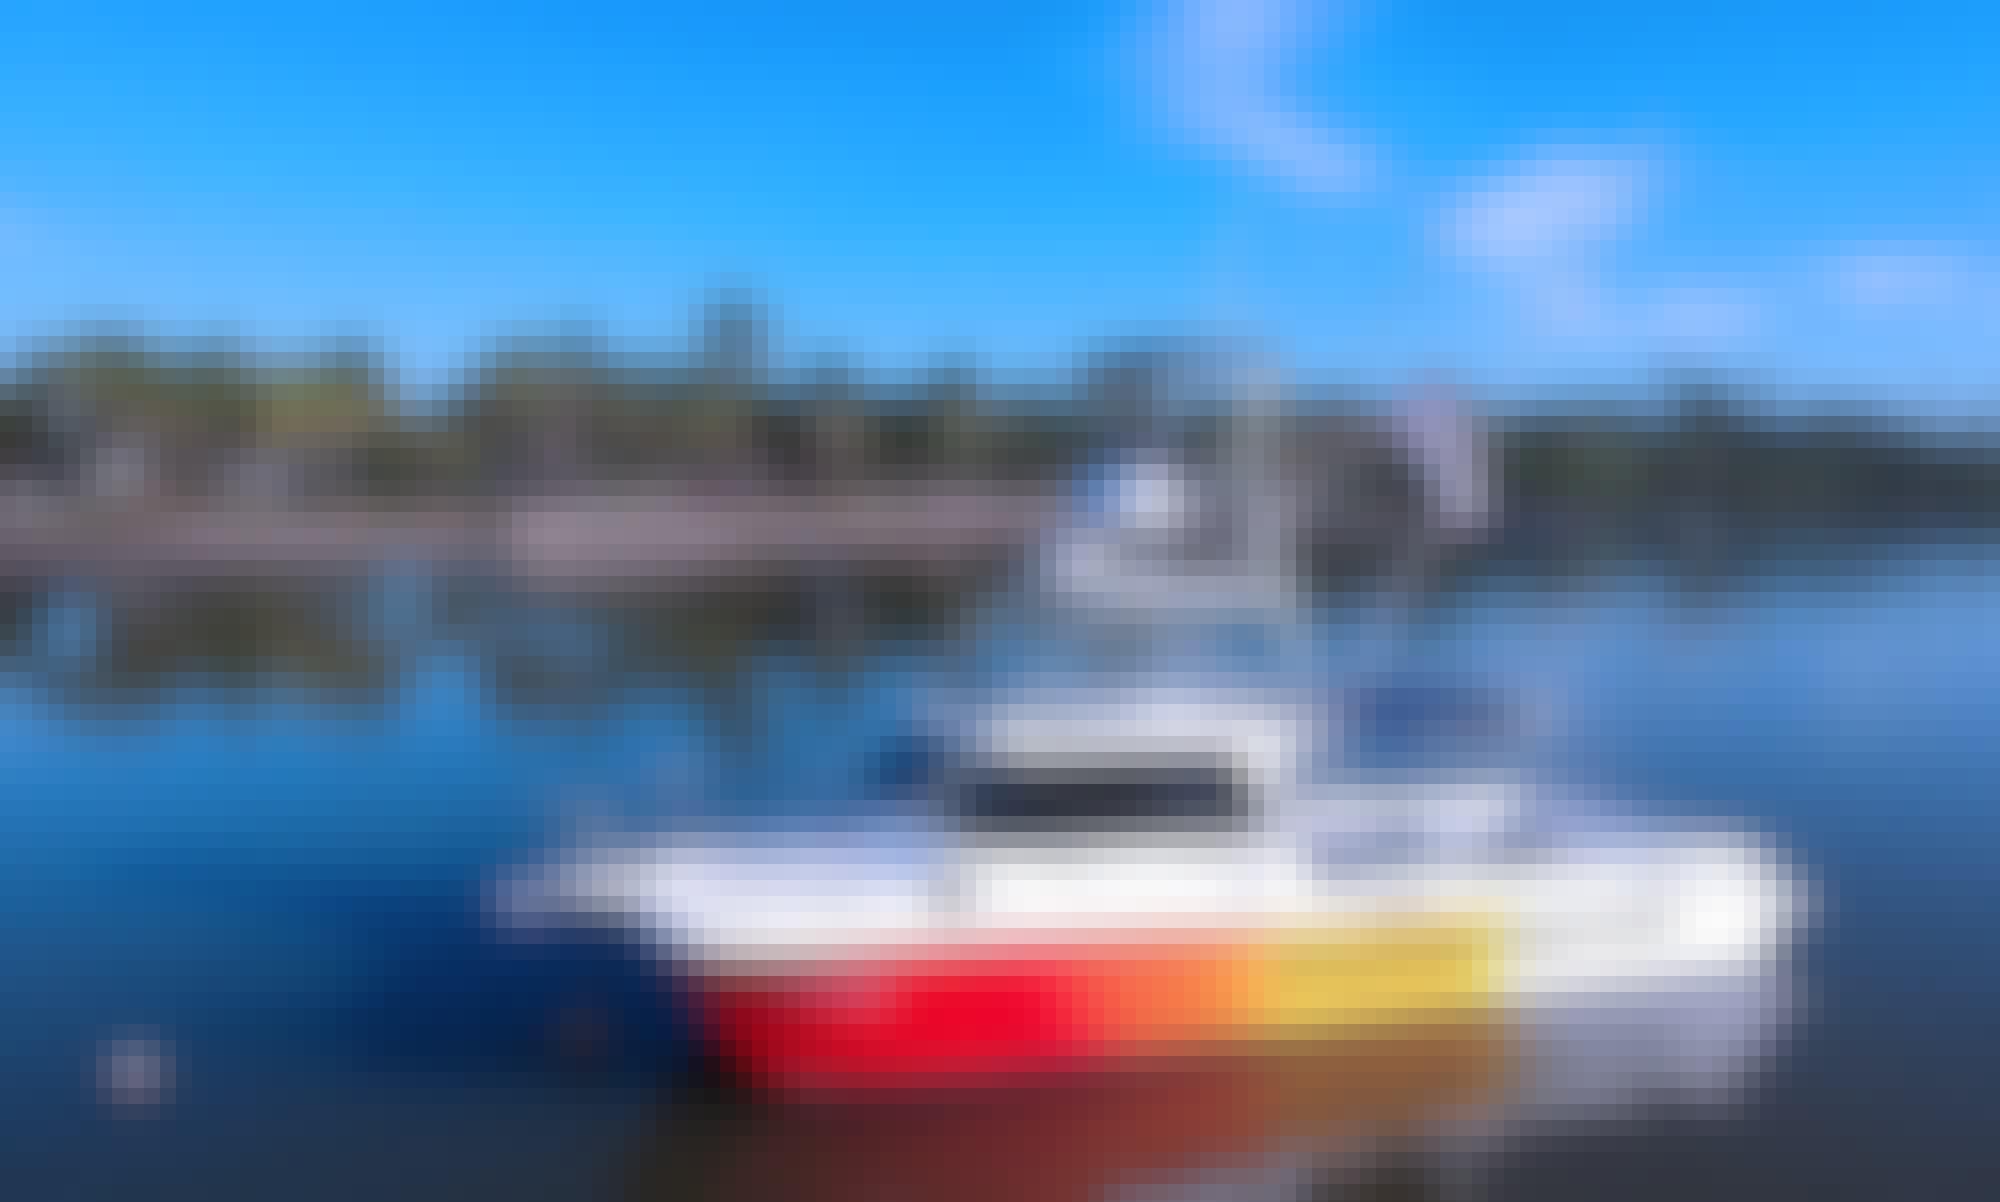 Come Cruise the Fiji Islands on 37' Kevlacat, 'Manua' Boat